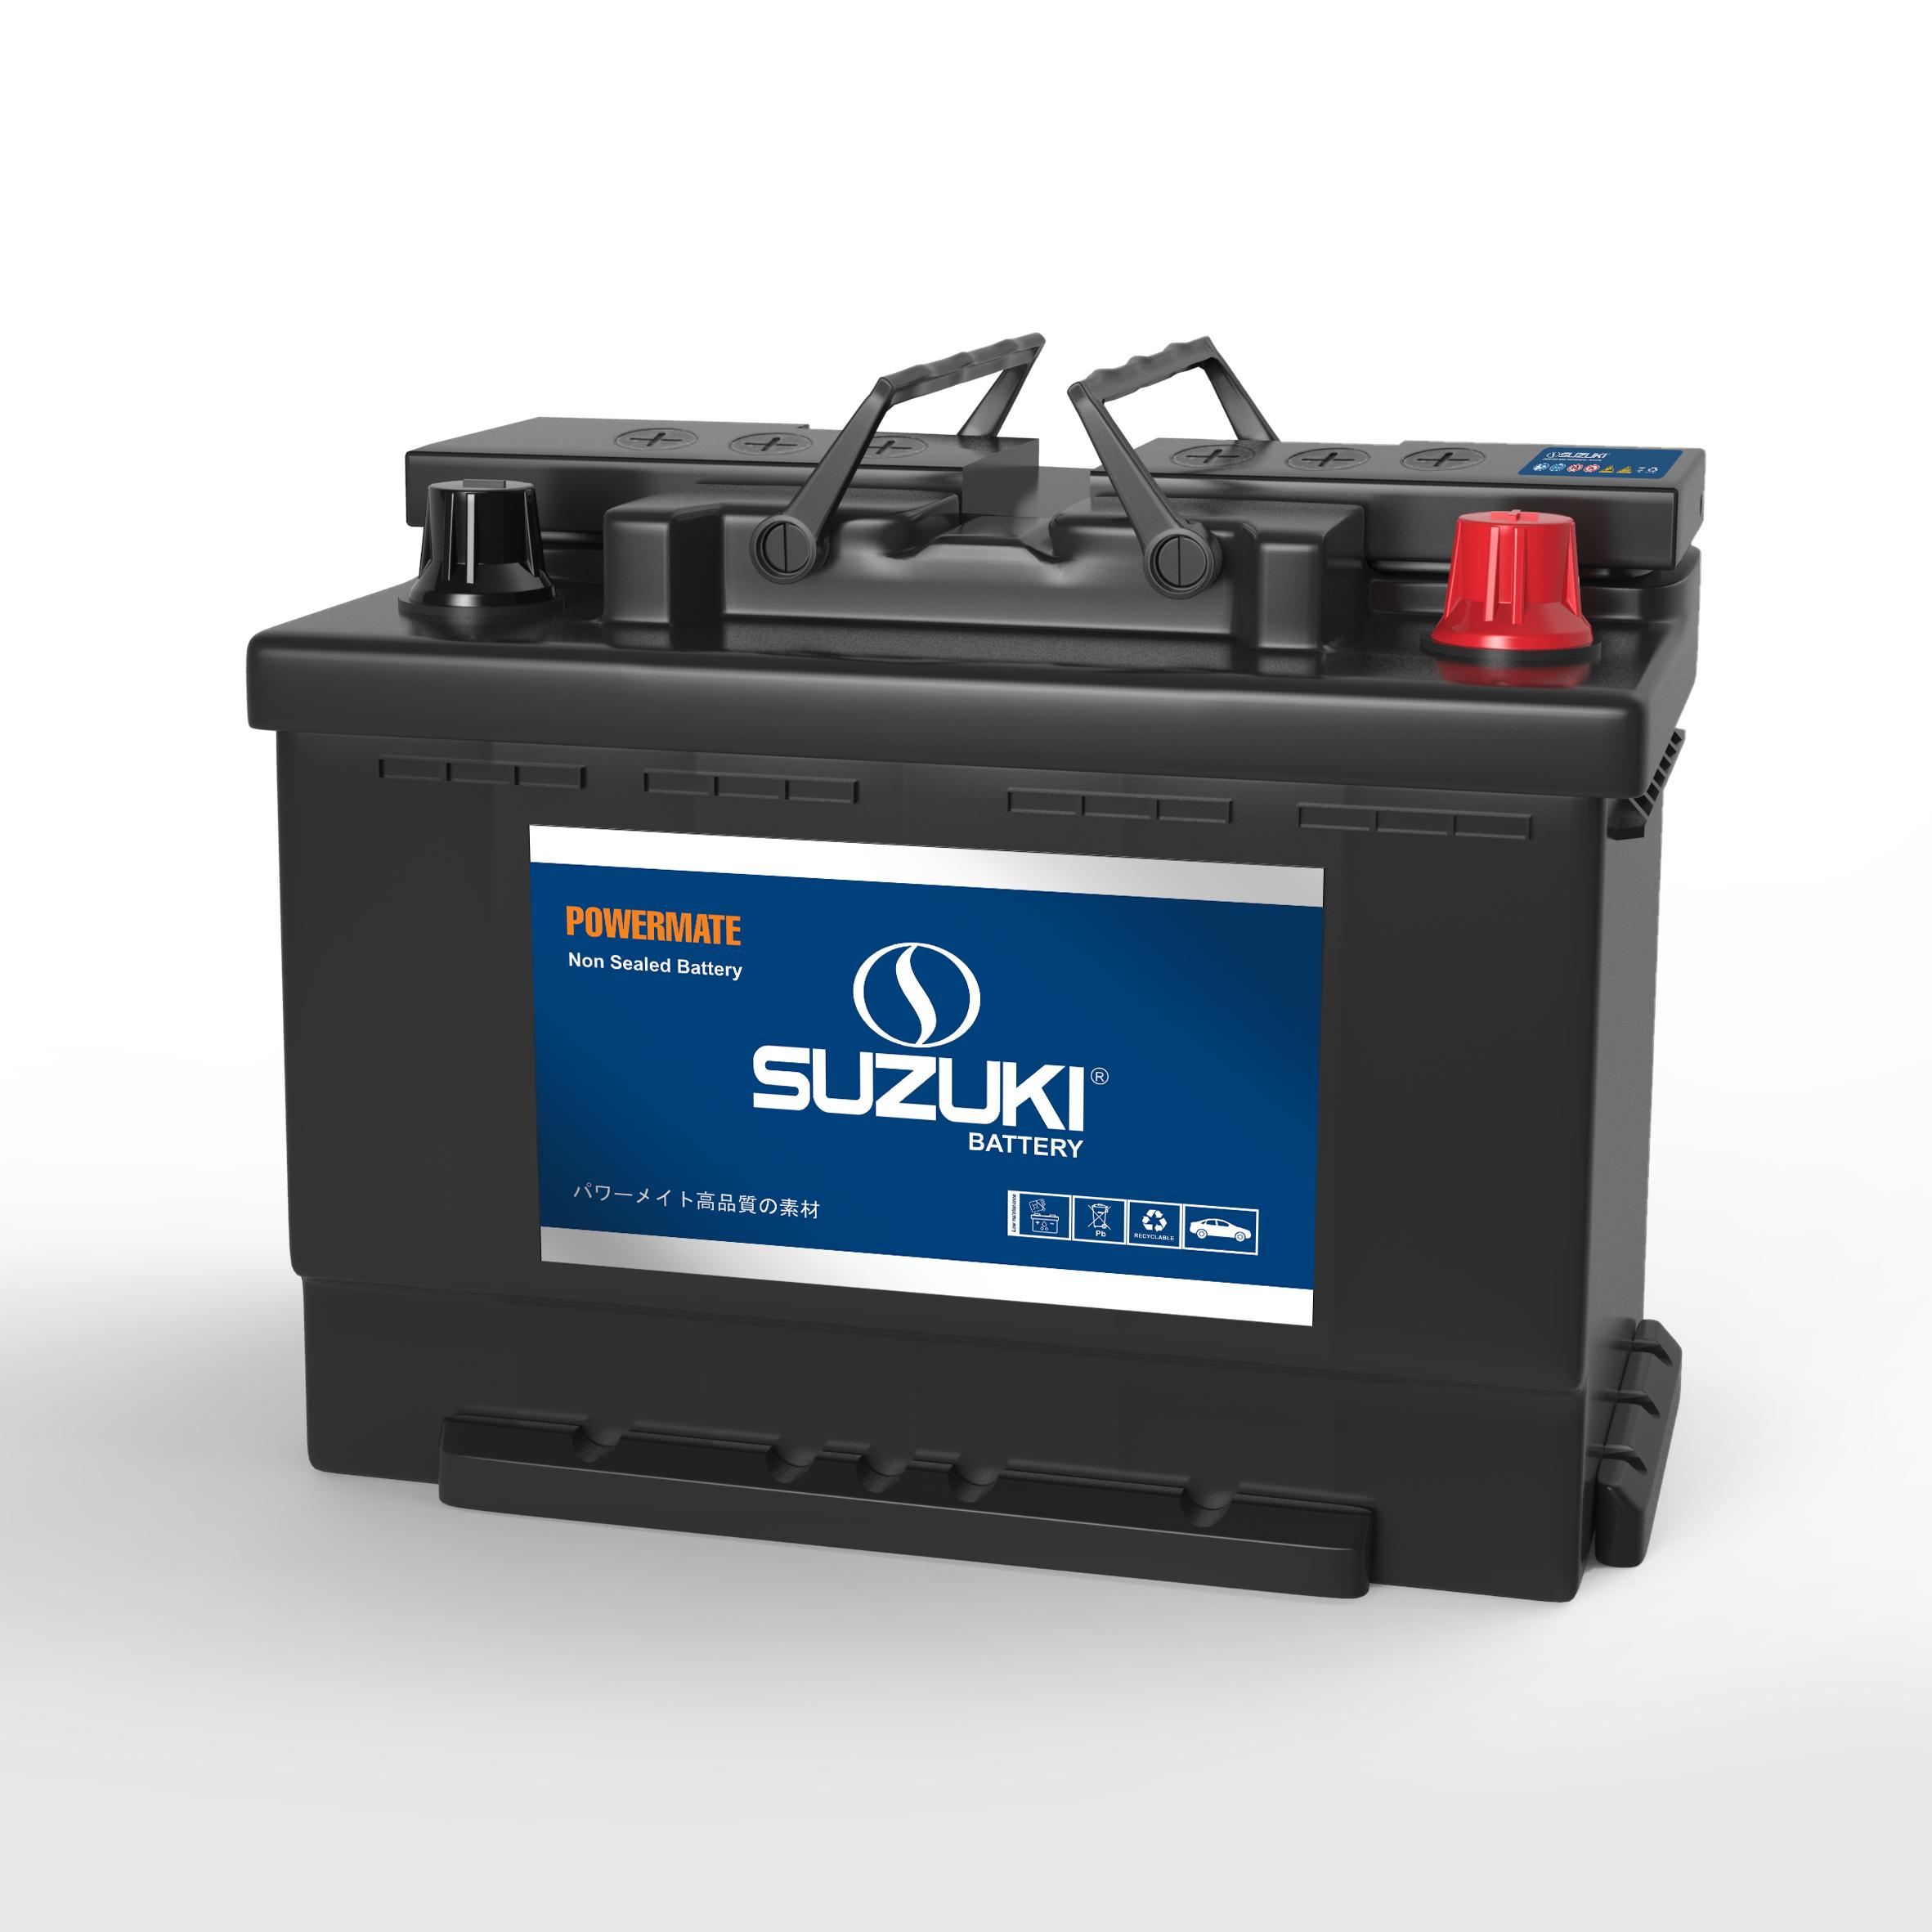 Suzuki Powermate Batteries series